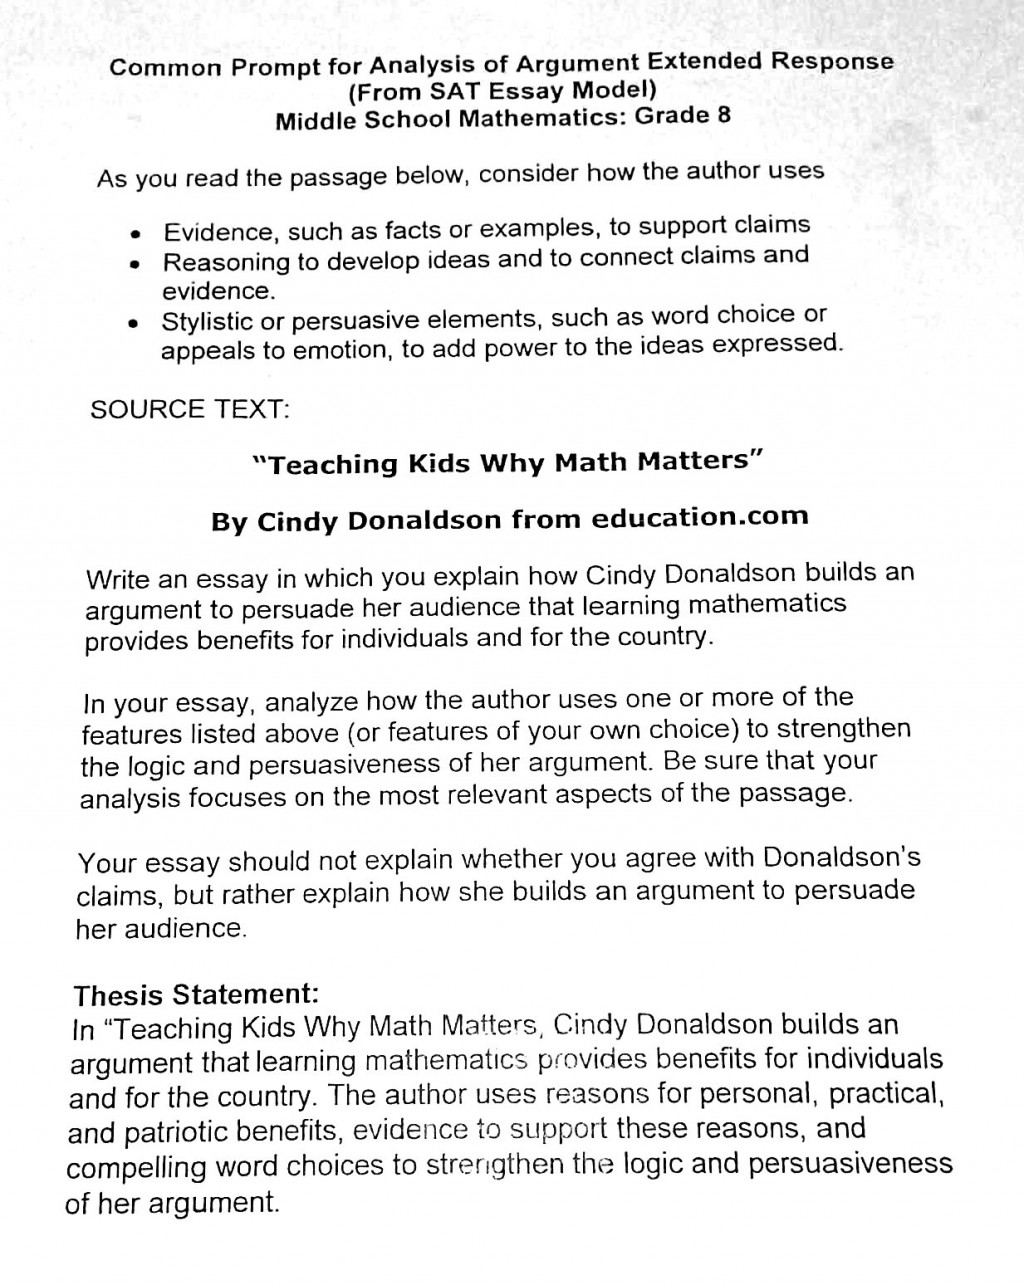 006 Gre Argument Essay Template Debate Essays Formats Analyze An Topics Answers Writingp Ets Pdf Marvelous Interesting Persuasive Questions Large